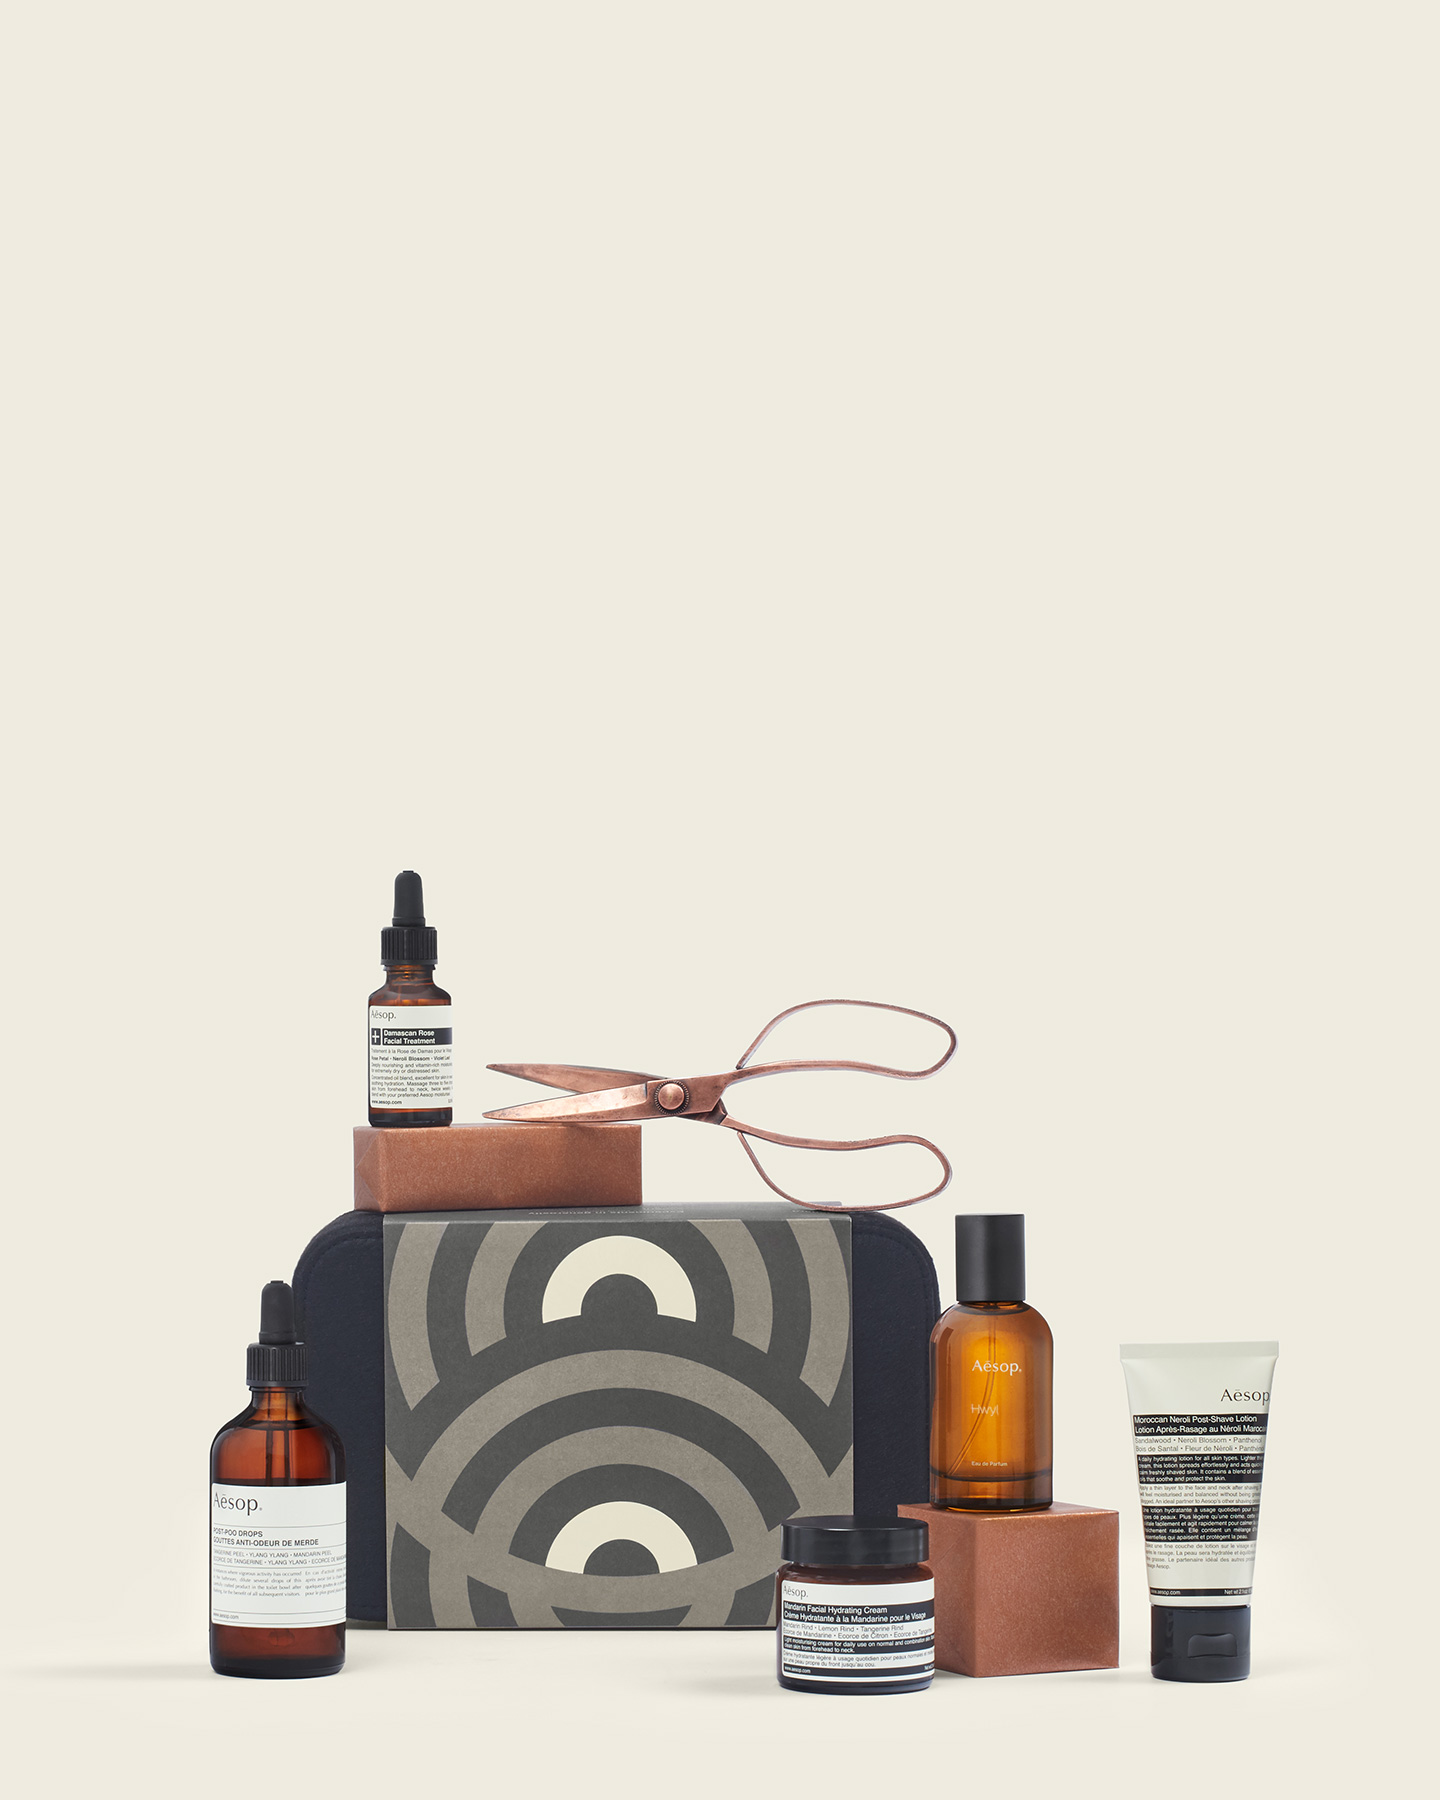 Aesop-Gift-Kits-2017-2018-Web-Site-Gift-Guide-LandingPage-Hero_Image_Split_Desktop_1440x1800px_2.jpg